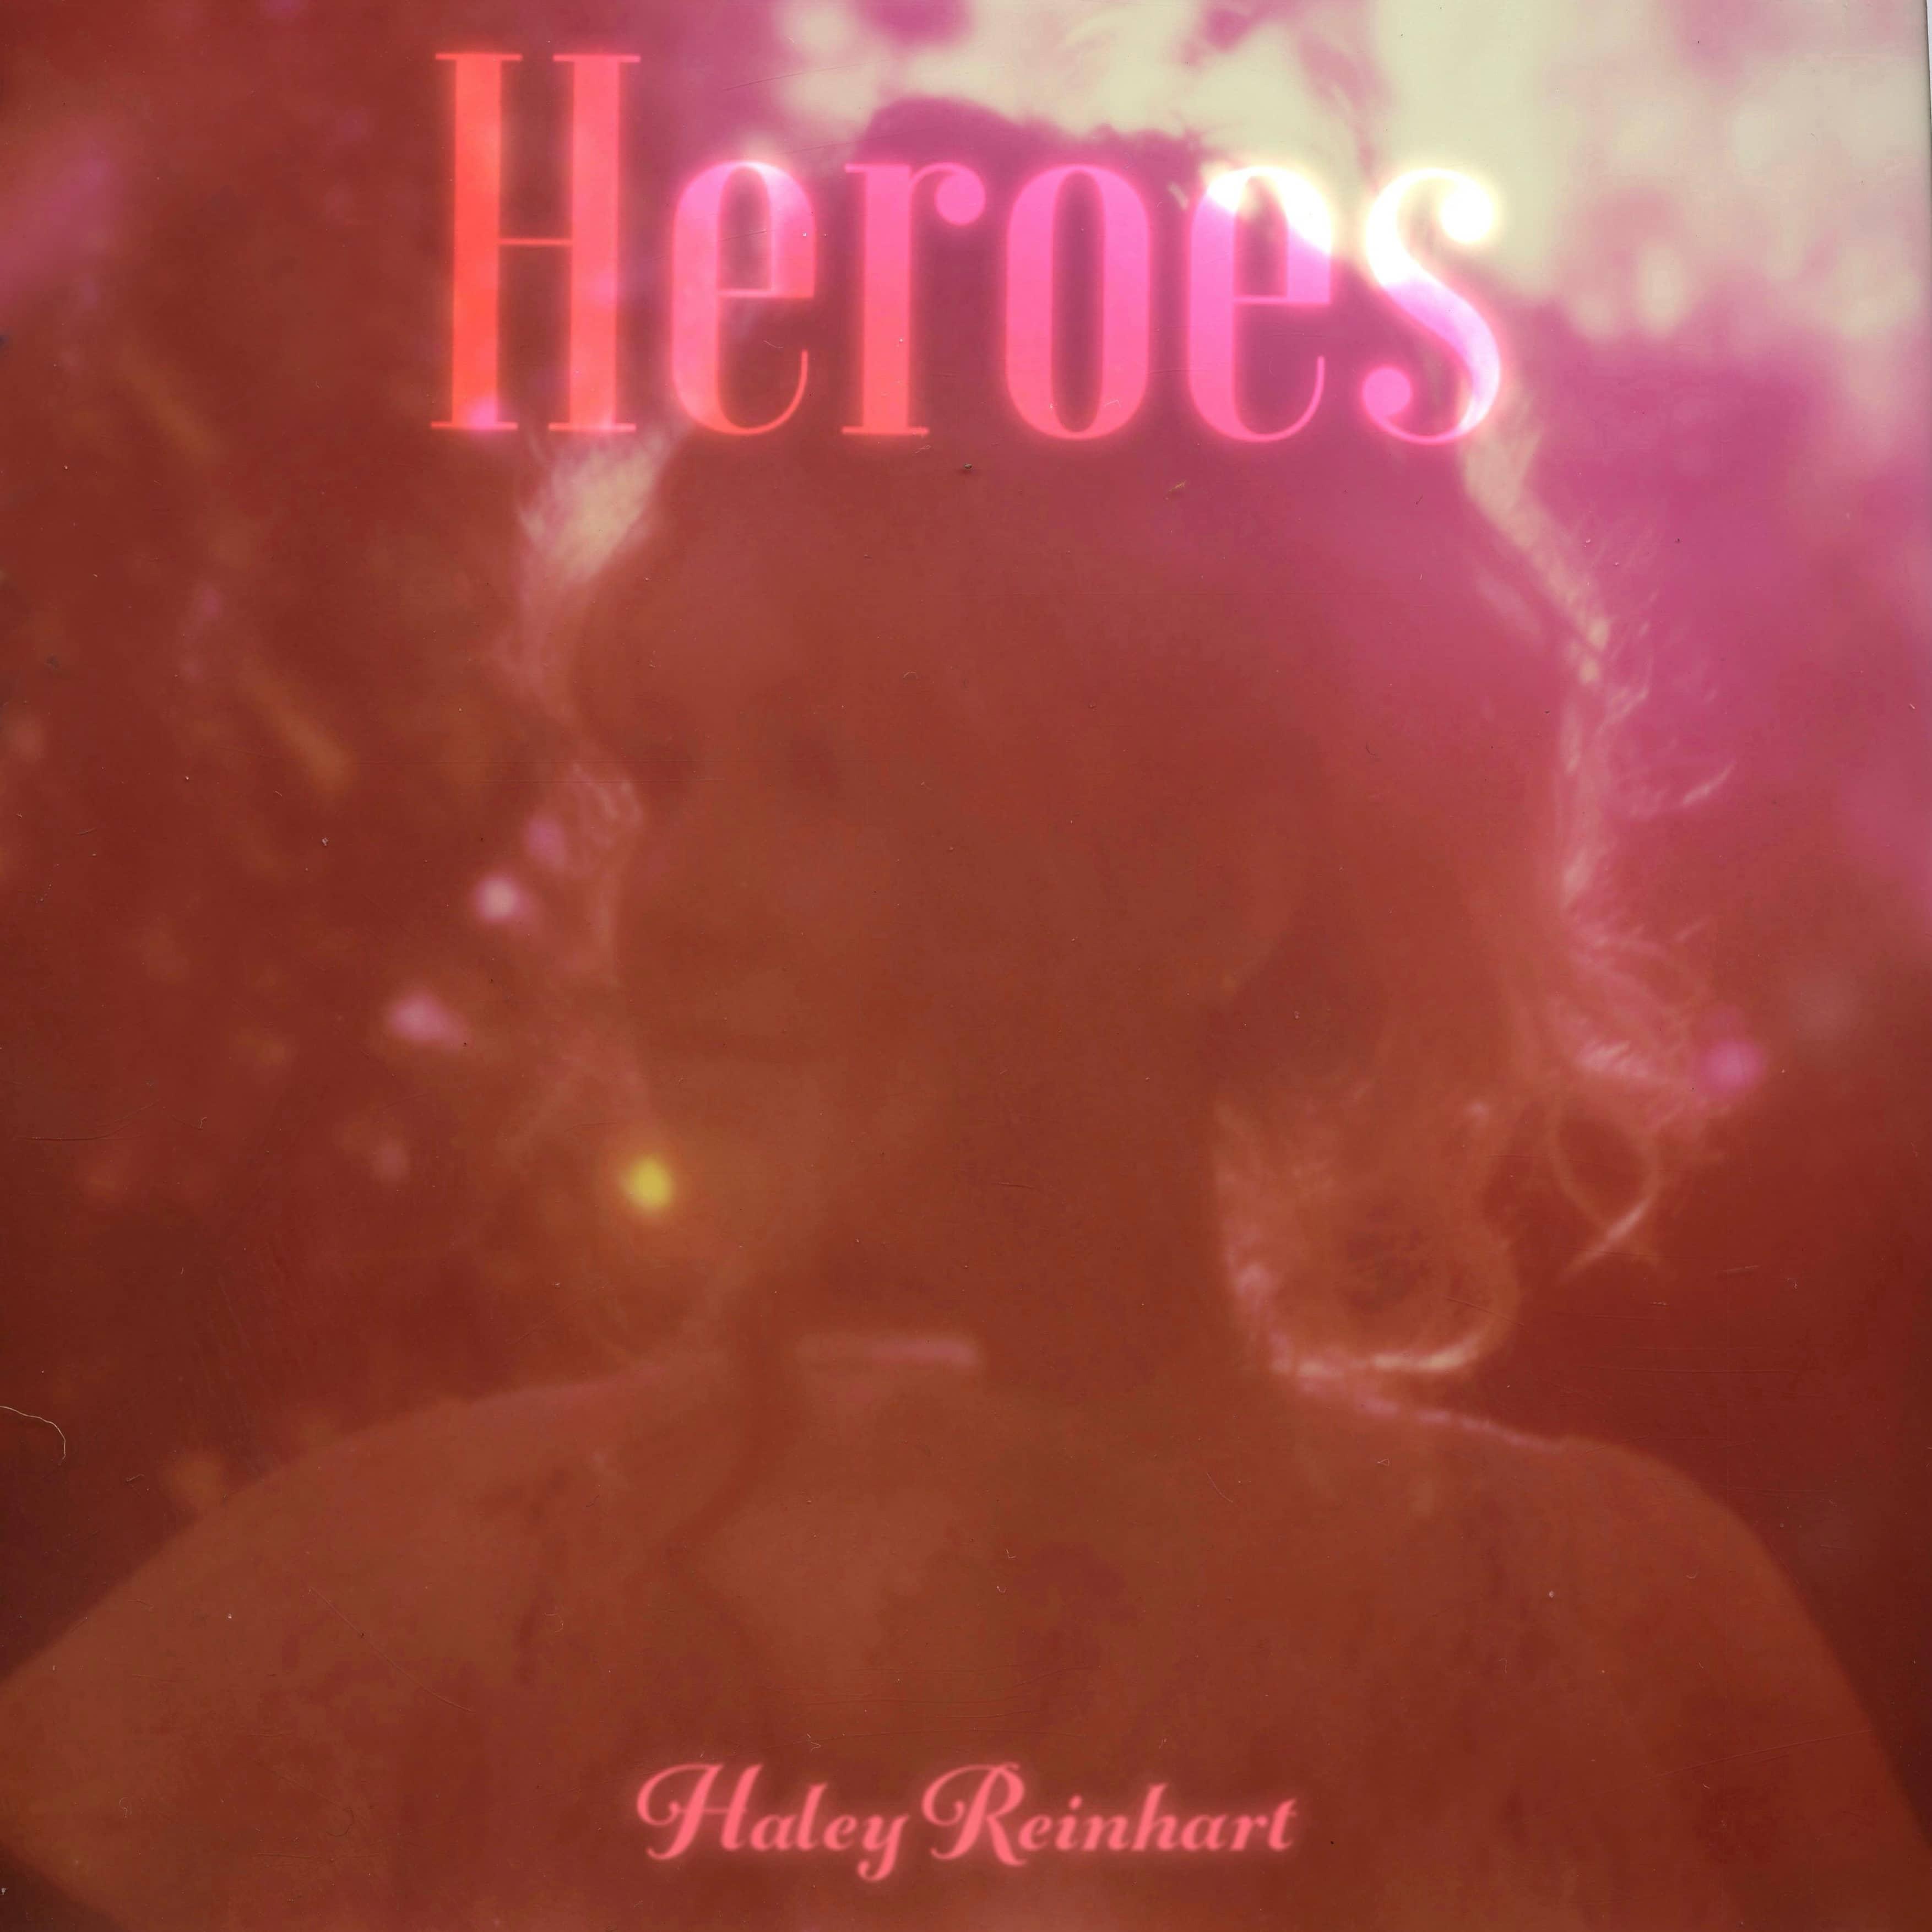 Haley Reinhart- Heroes